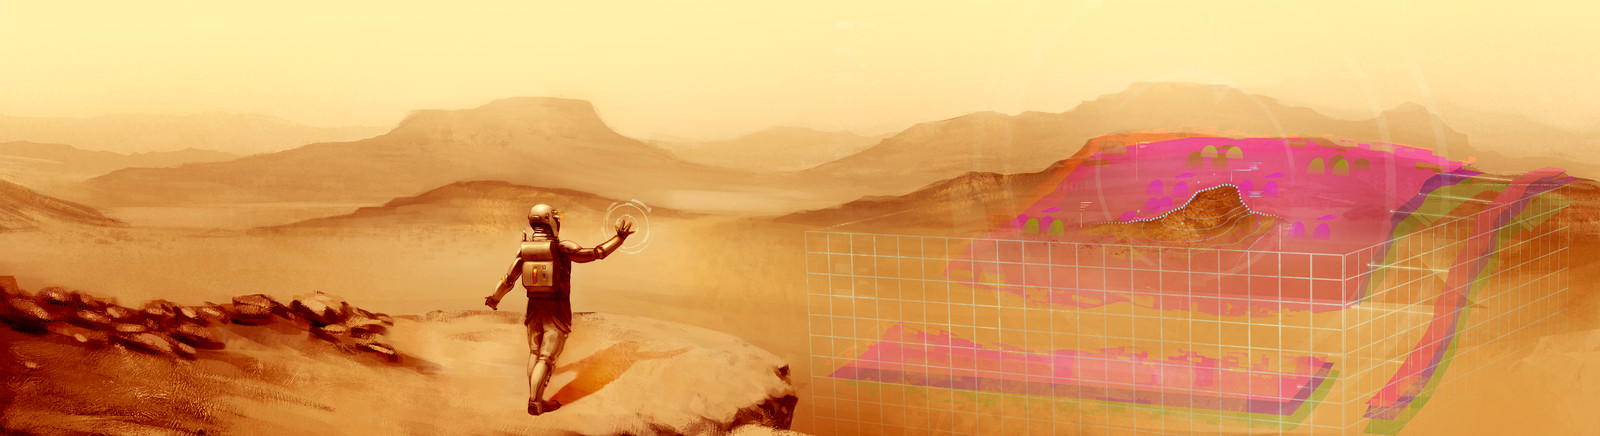 Mars 3D terrain discovery